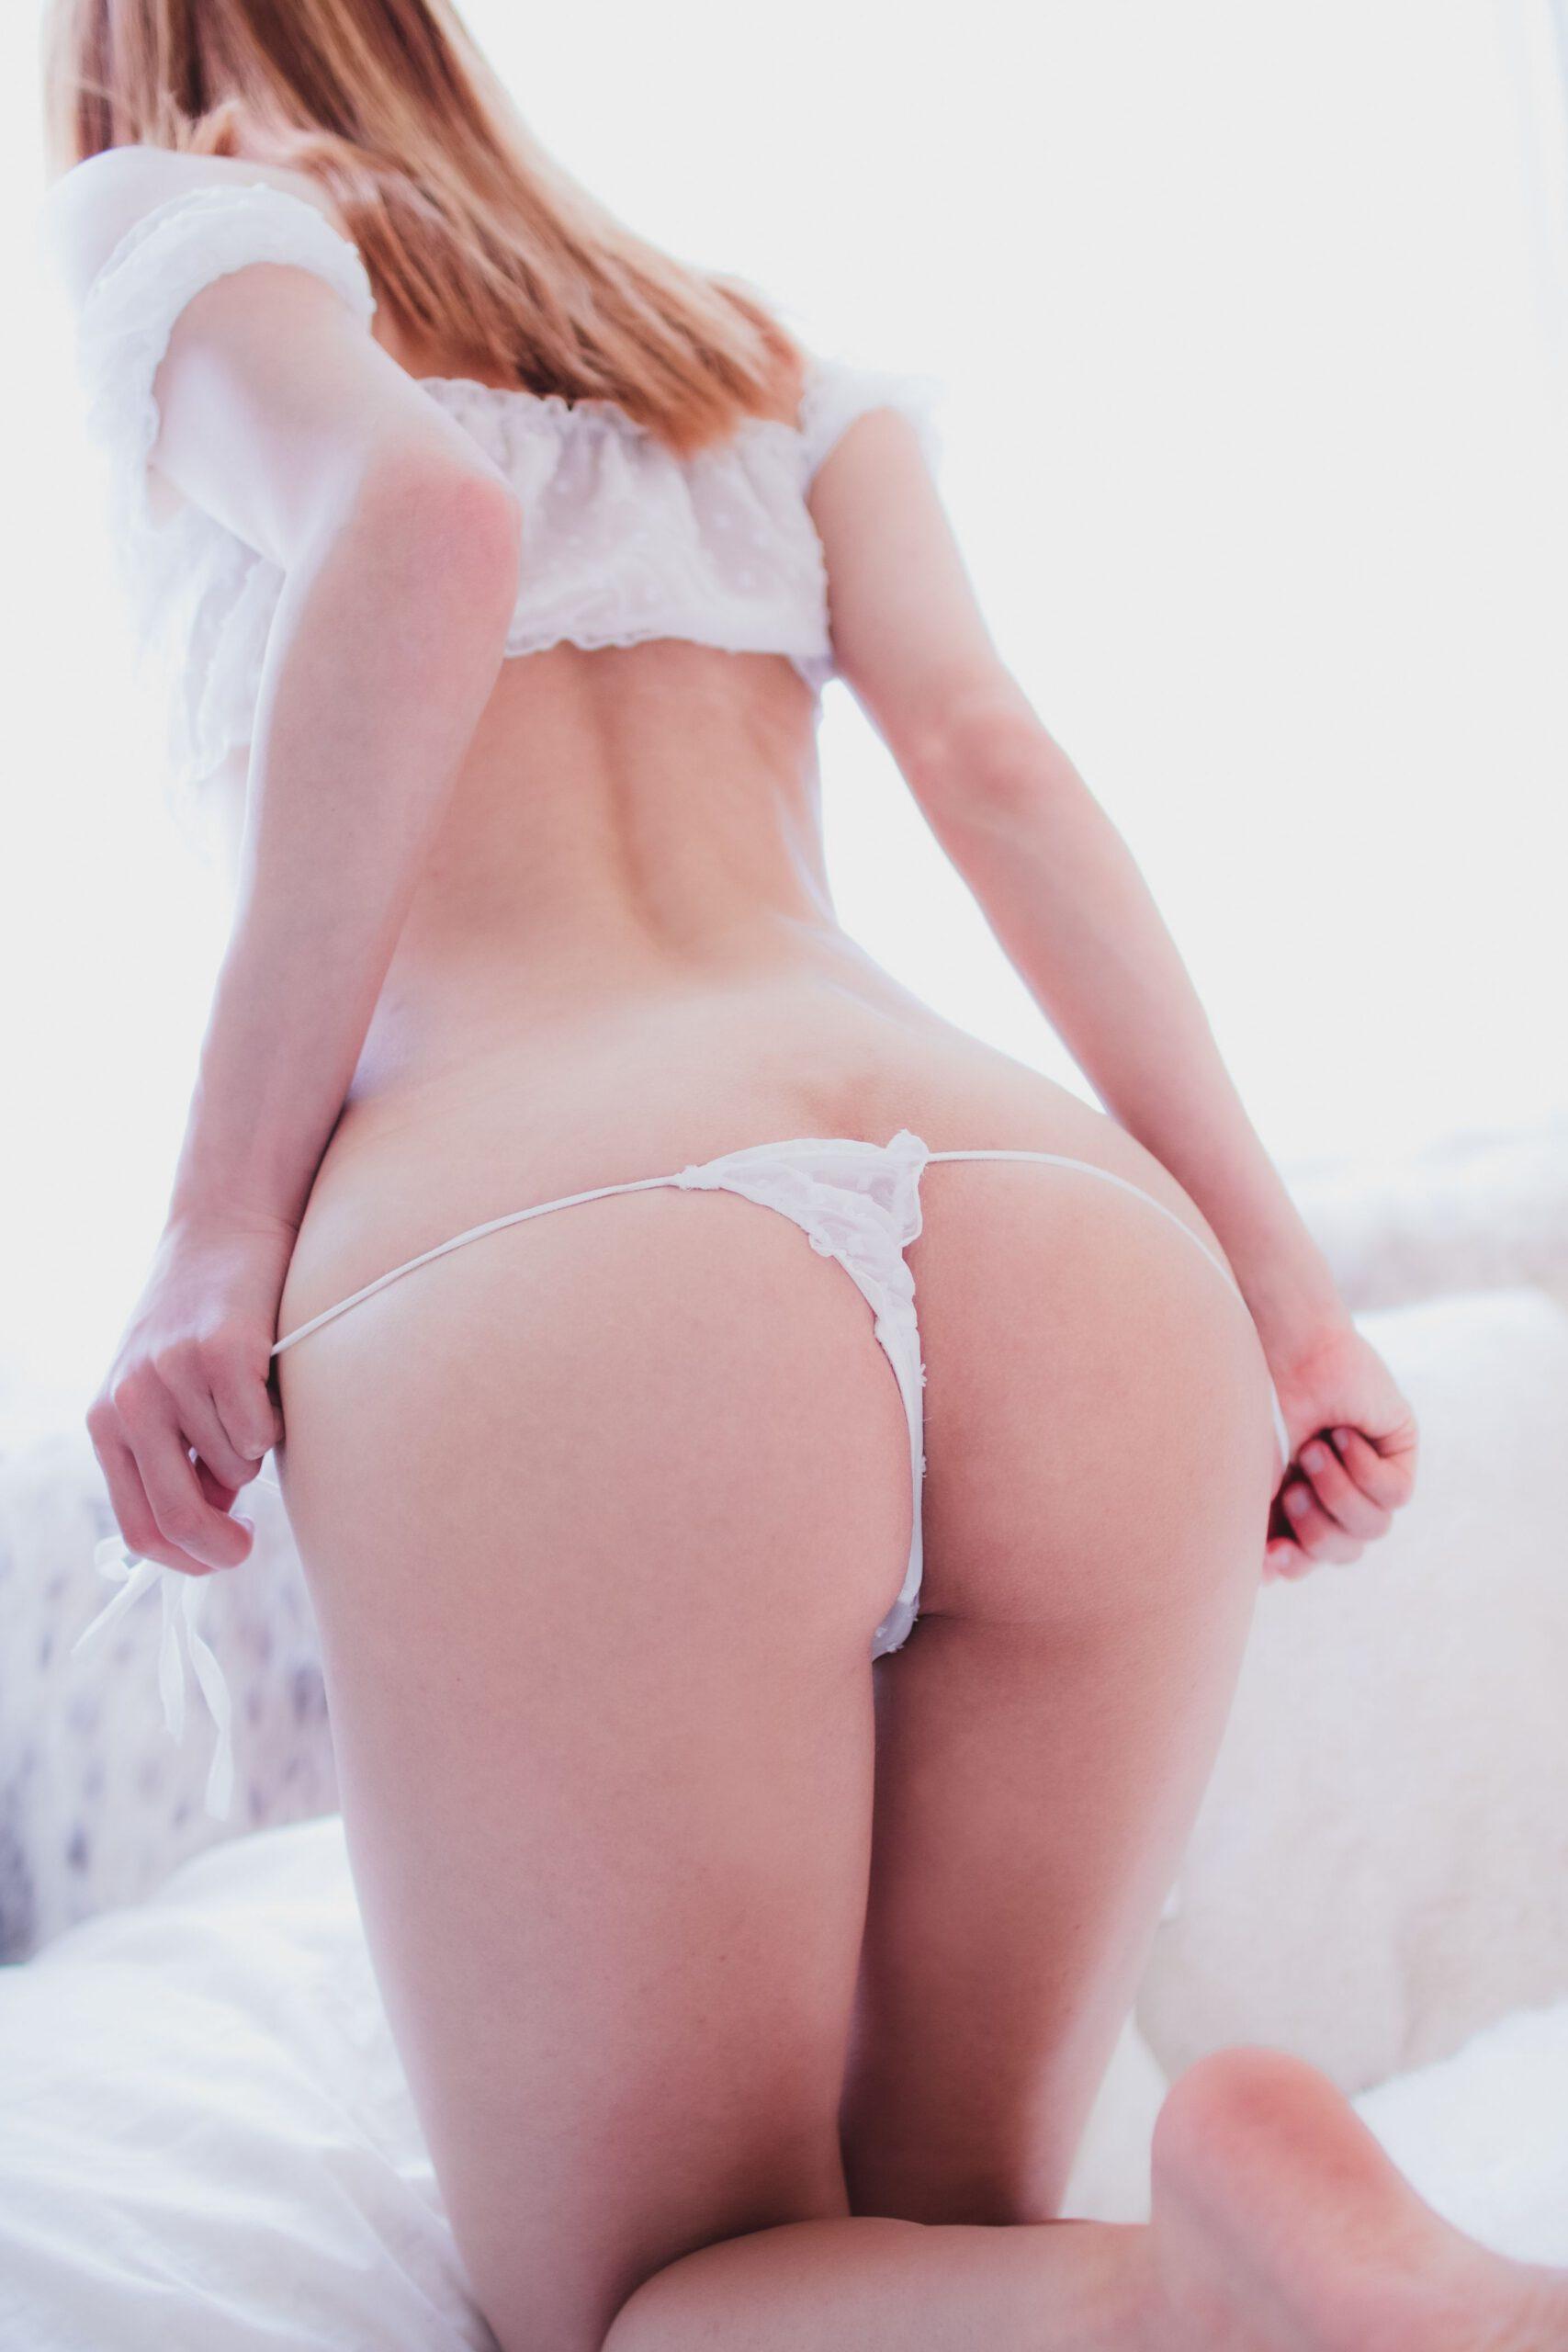 Madison Kate White See Through Lingerie 0020